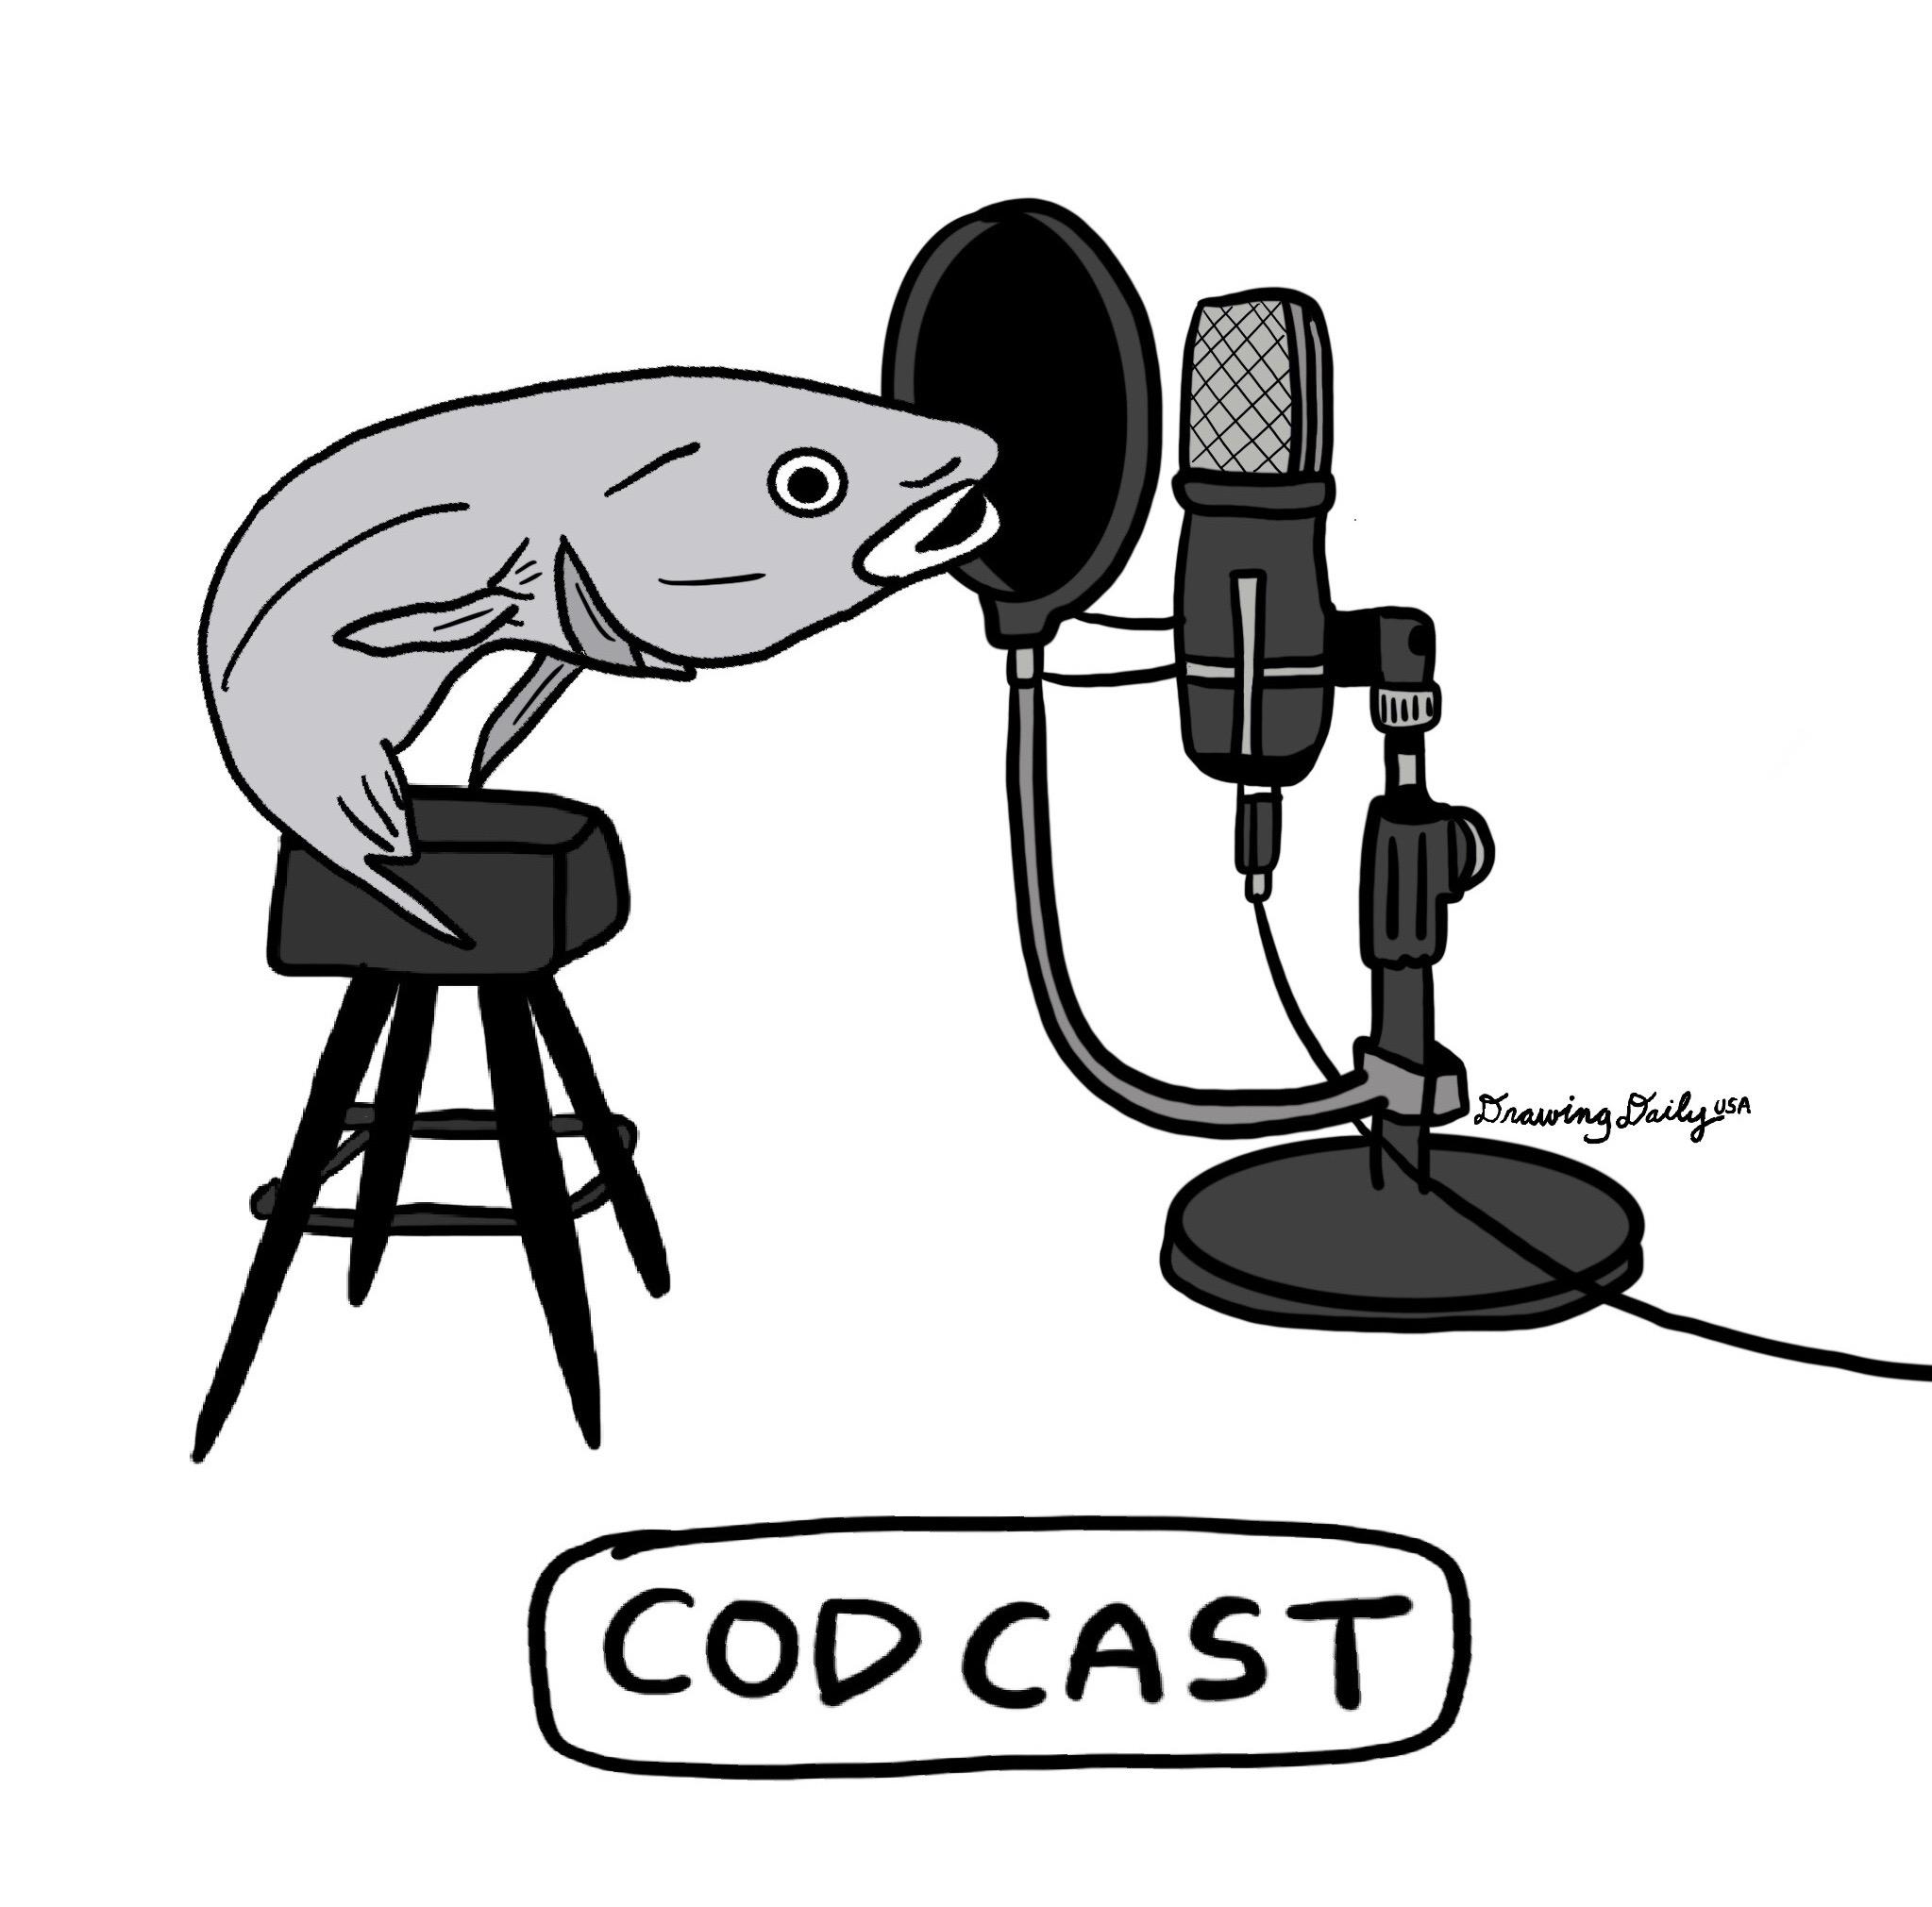 Cod Cast